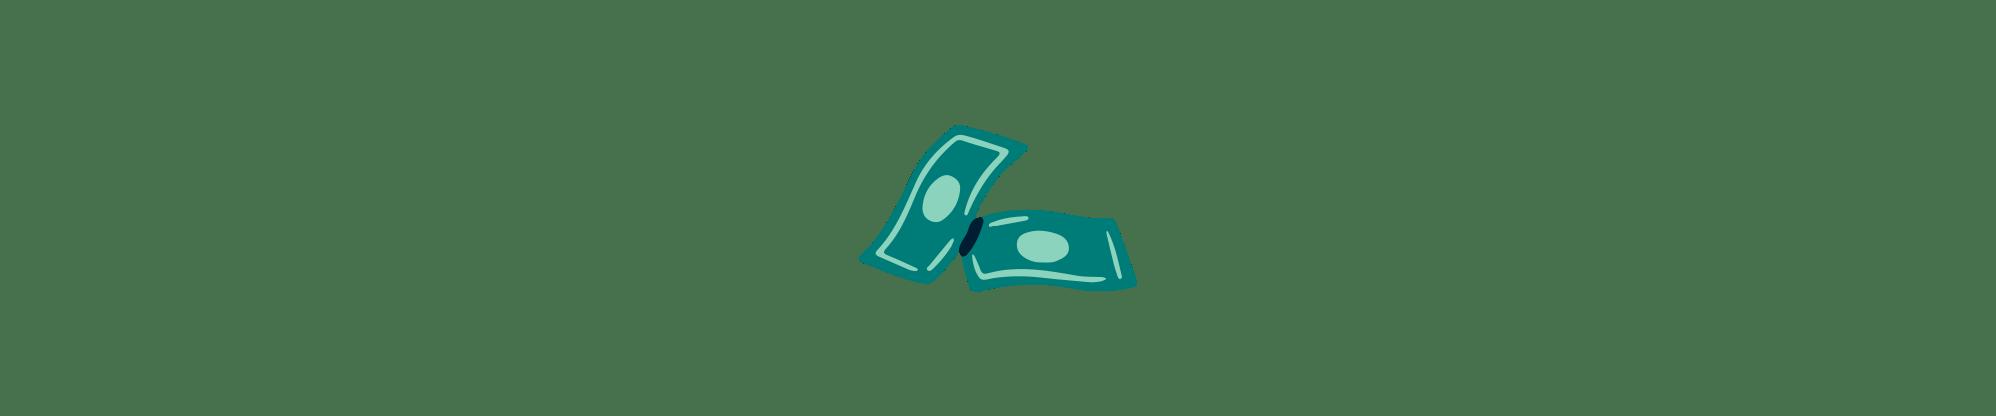 two dollar bills illustration